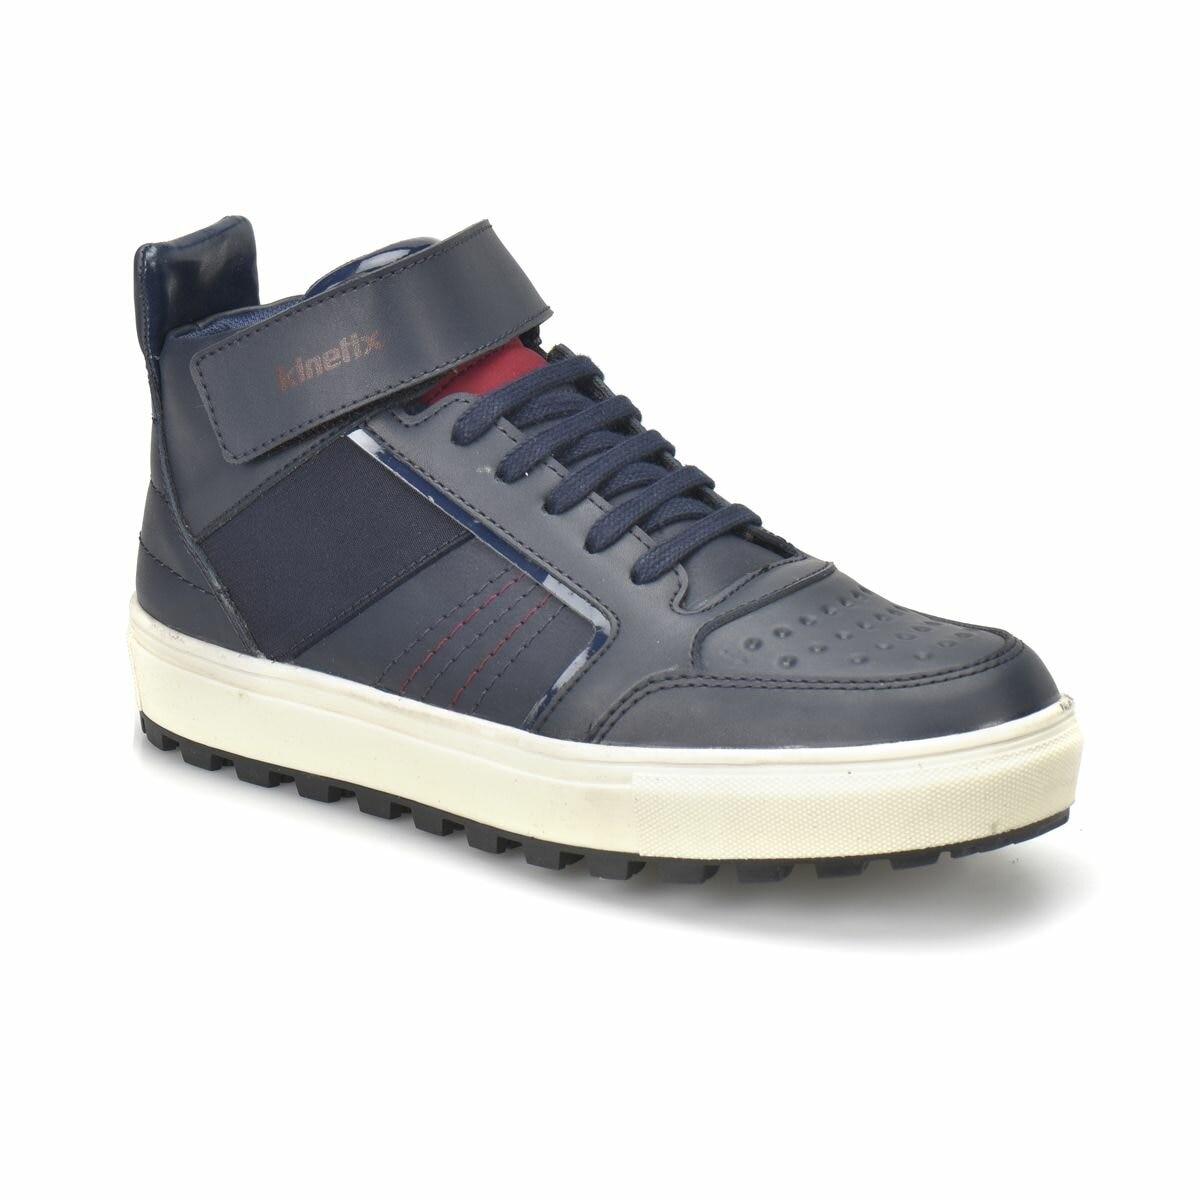 FLO BIKOS Navy Blue Men 'S Sneaker Shoes KINETIX